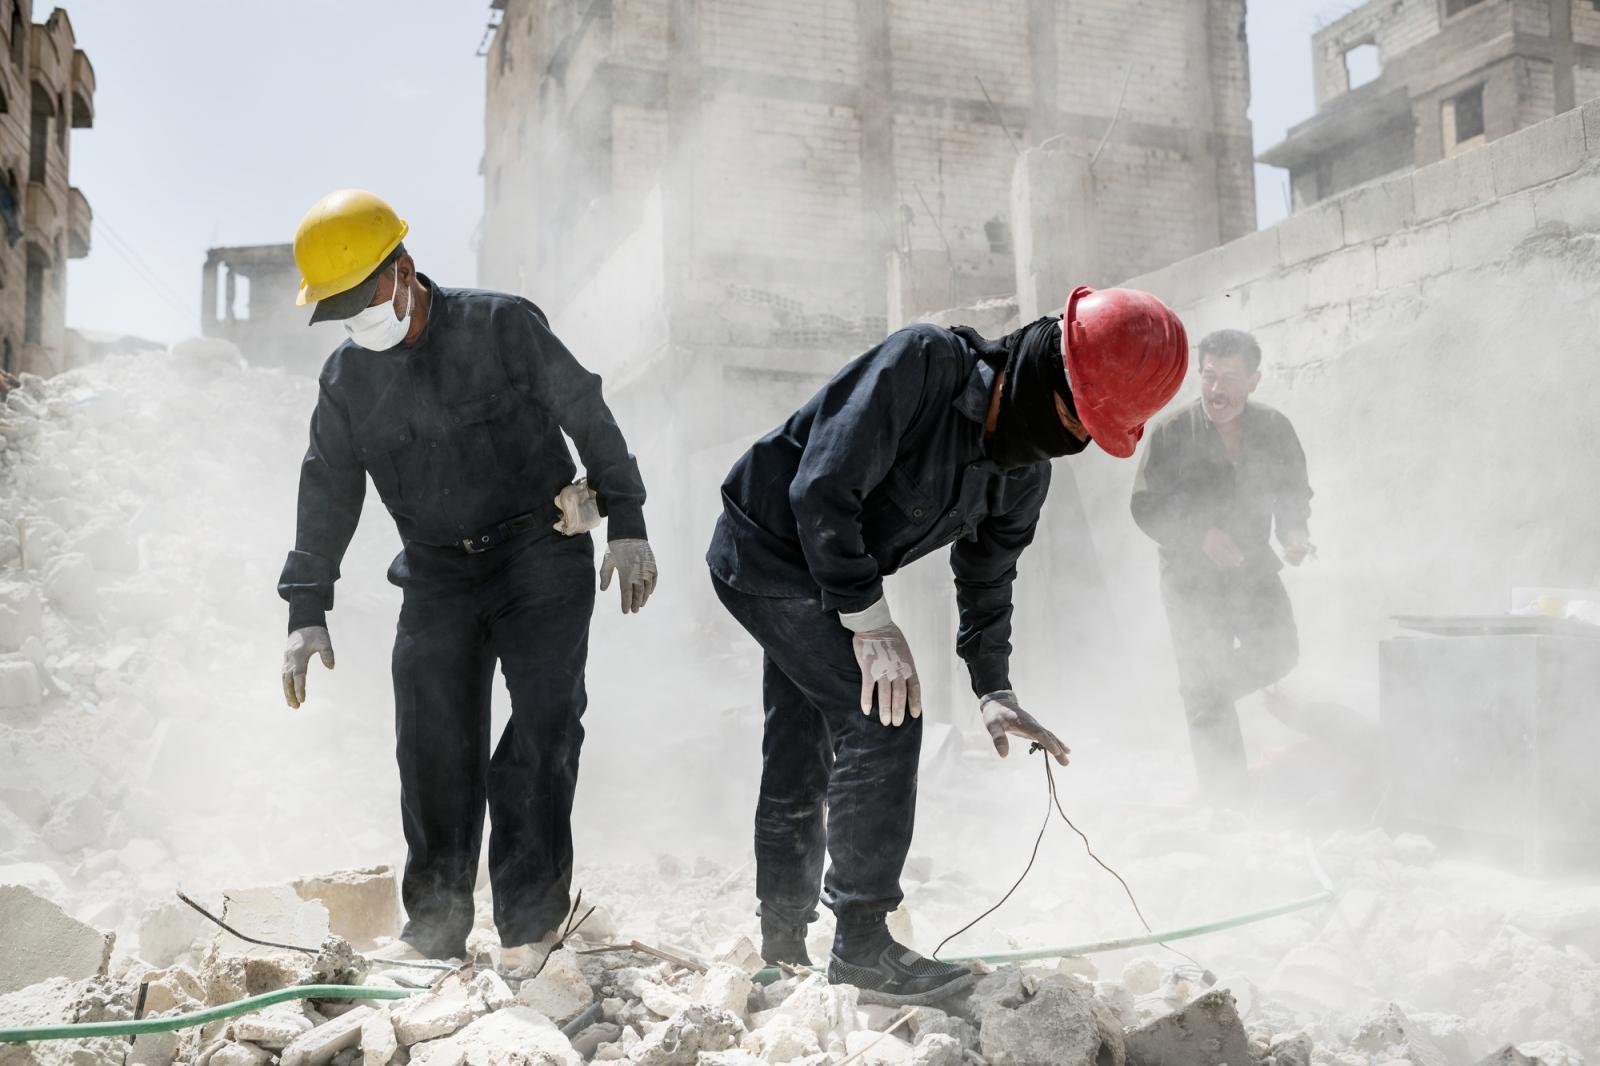 Photography image - Loading VS-Raqqa-CC-008.JPG